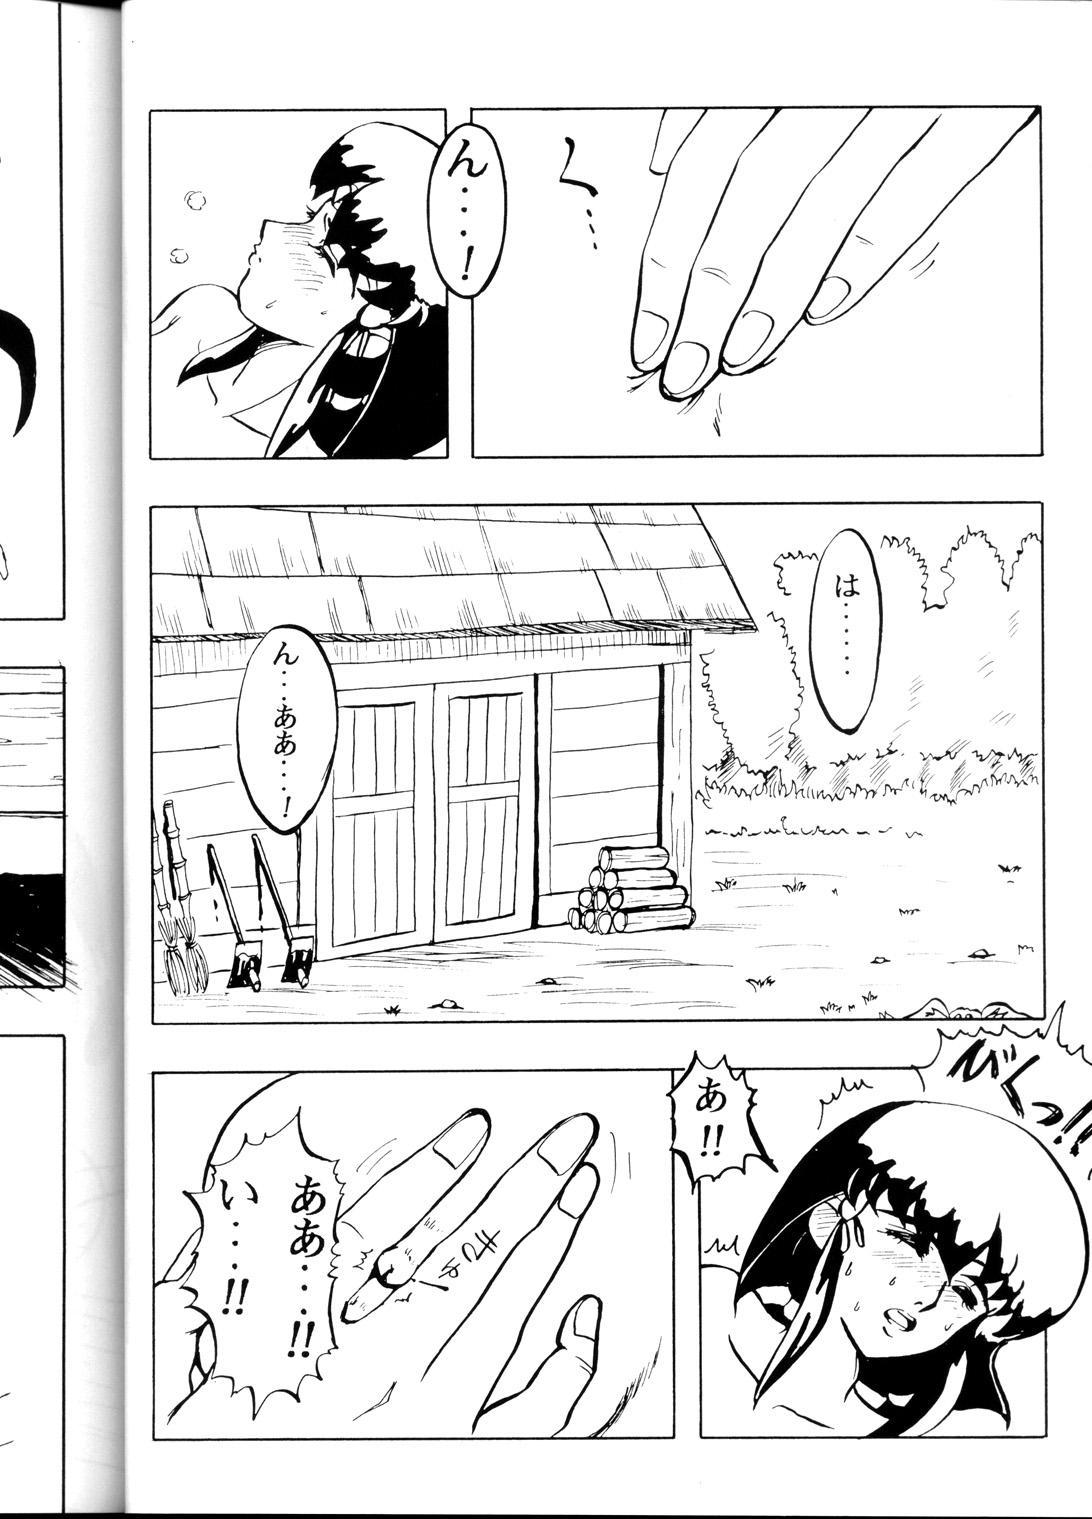 [B.B.C] Tenchi Muyou! Ryou-ou-ki Kaiteiben (Tenchi Muyou!) 38